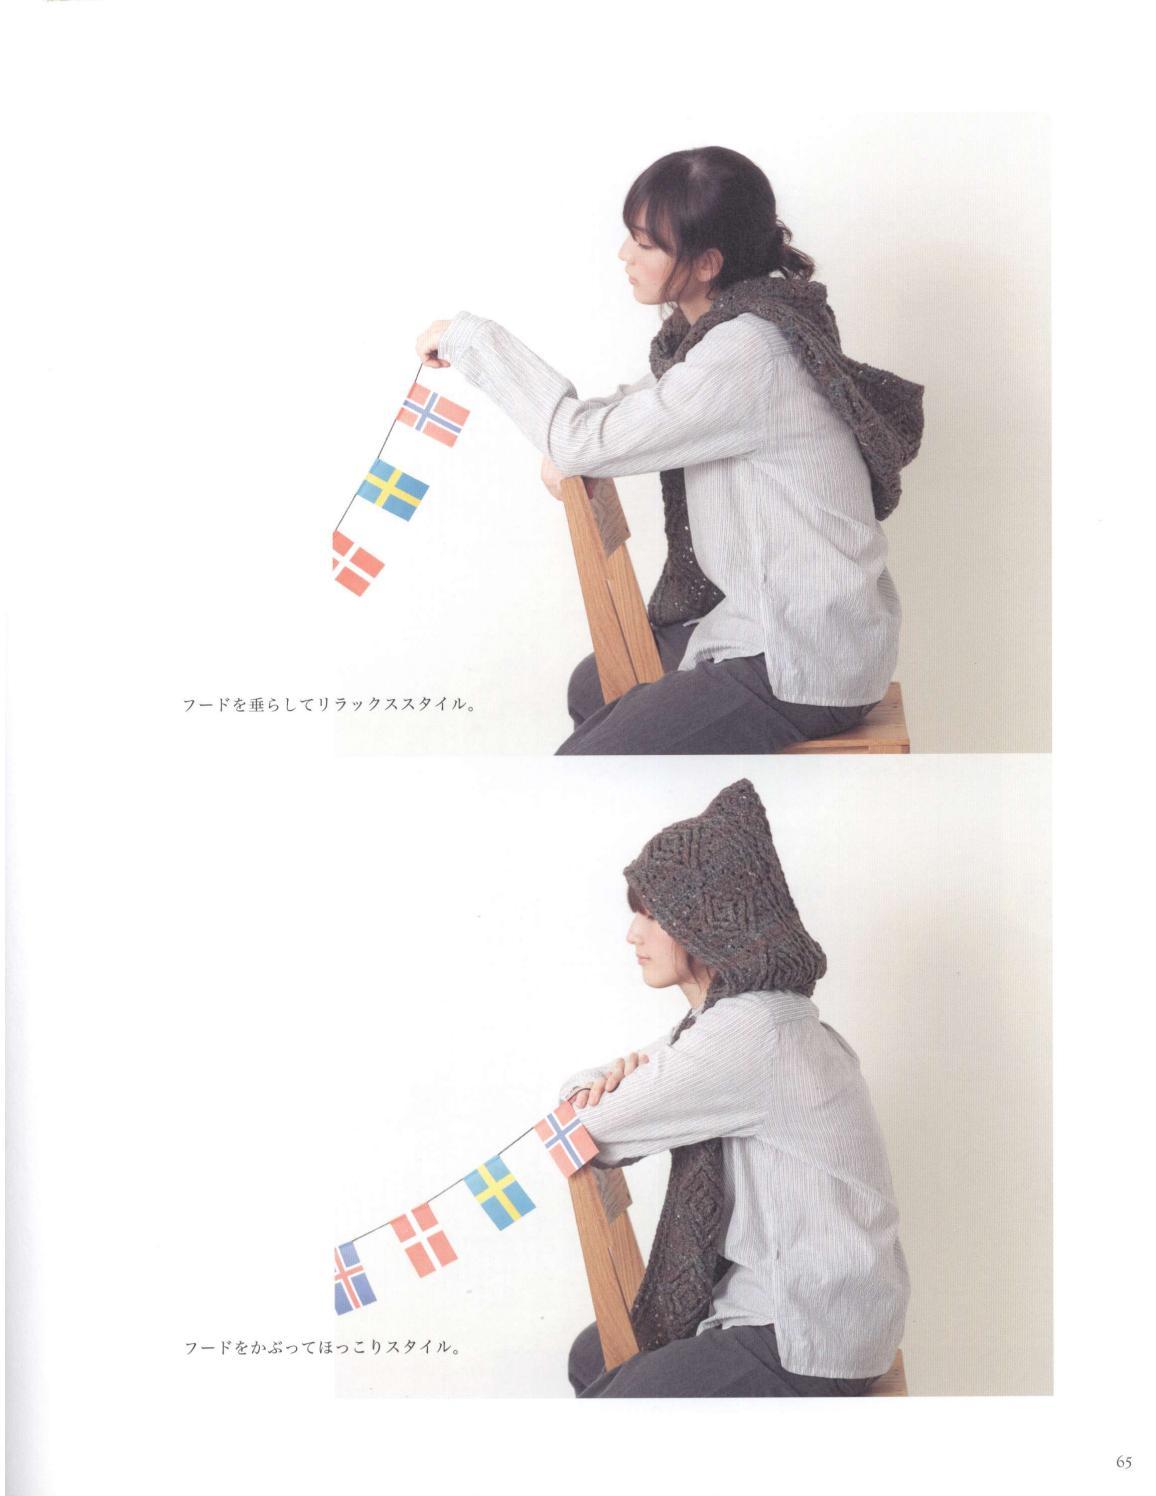 Asahi original crochet best selection 2012 page 65